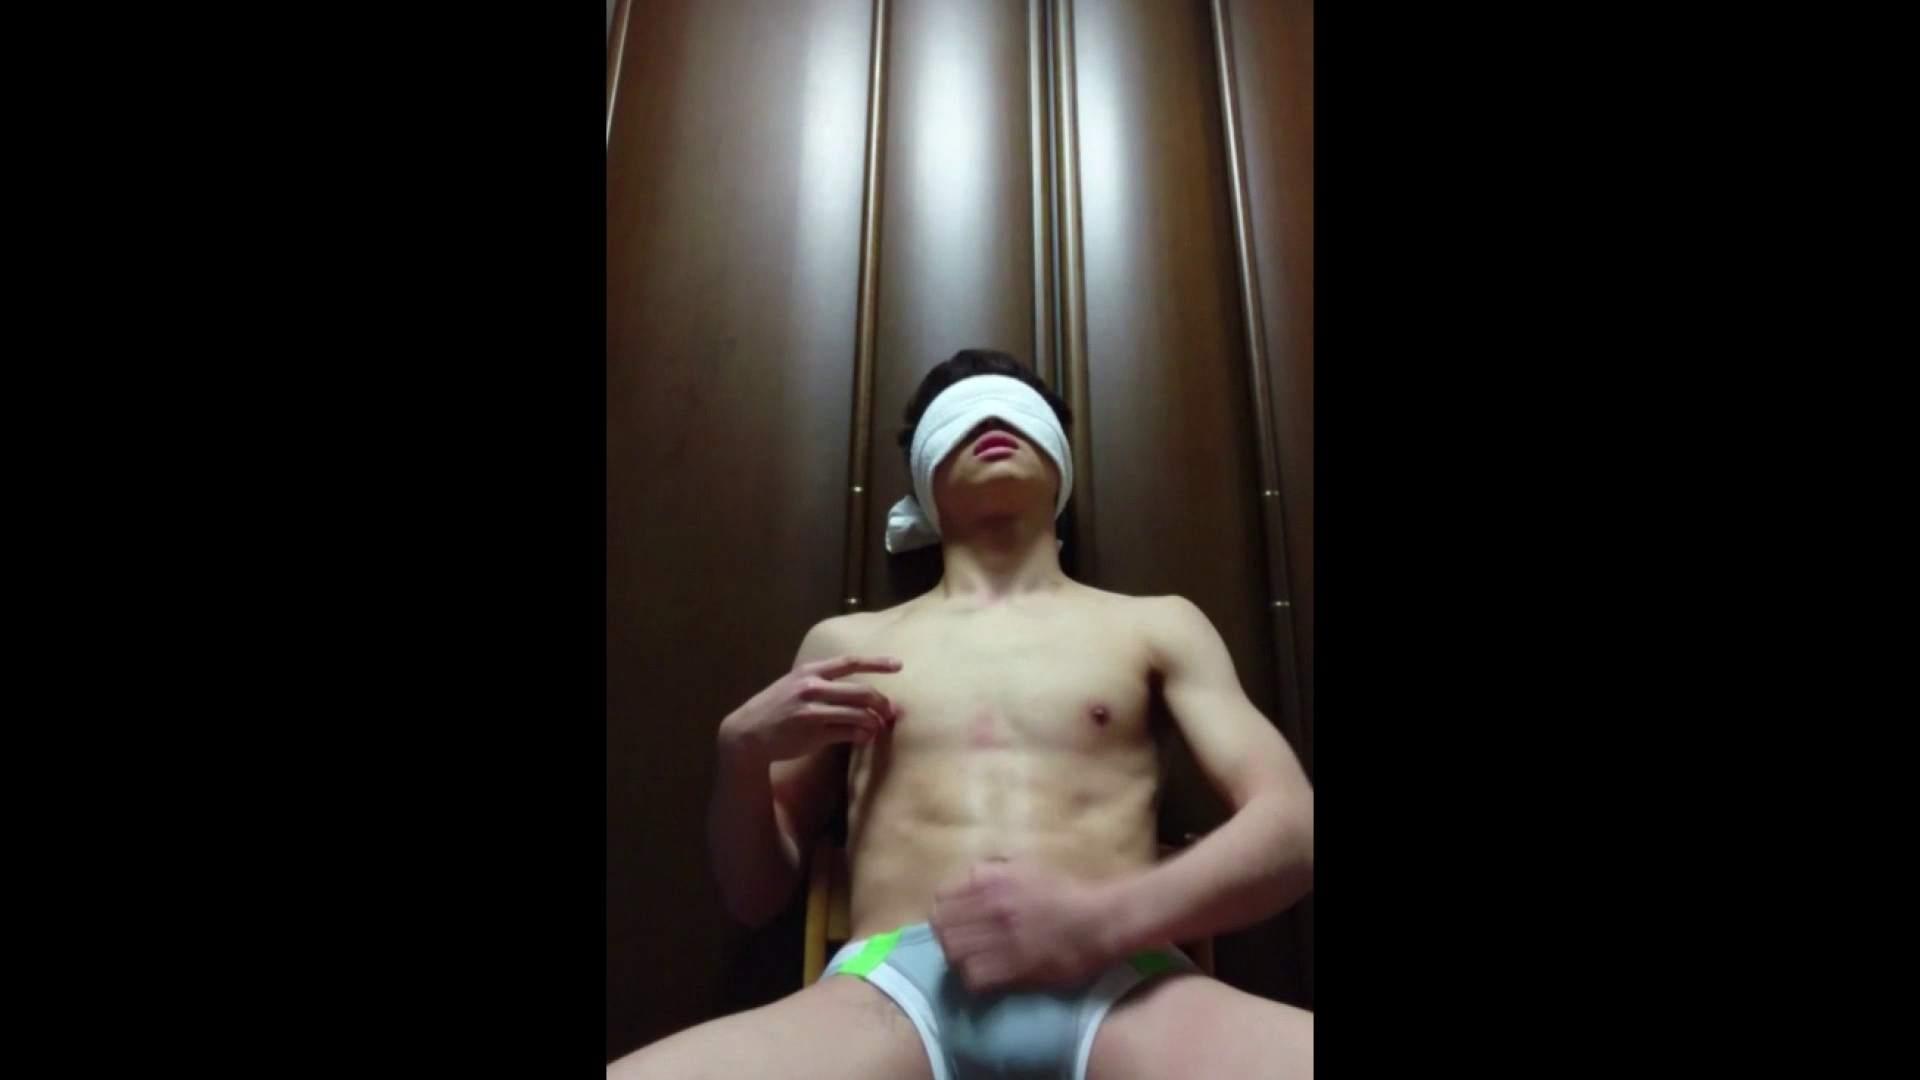 個人撮影 自慰の極意 Vol.21 無修正 男同士動画 93pic 83